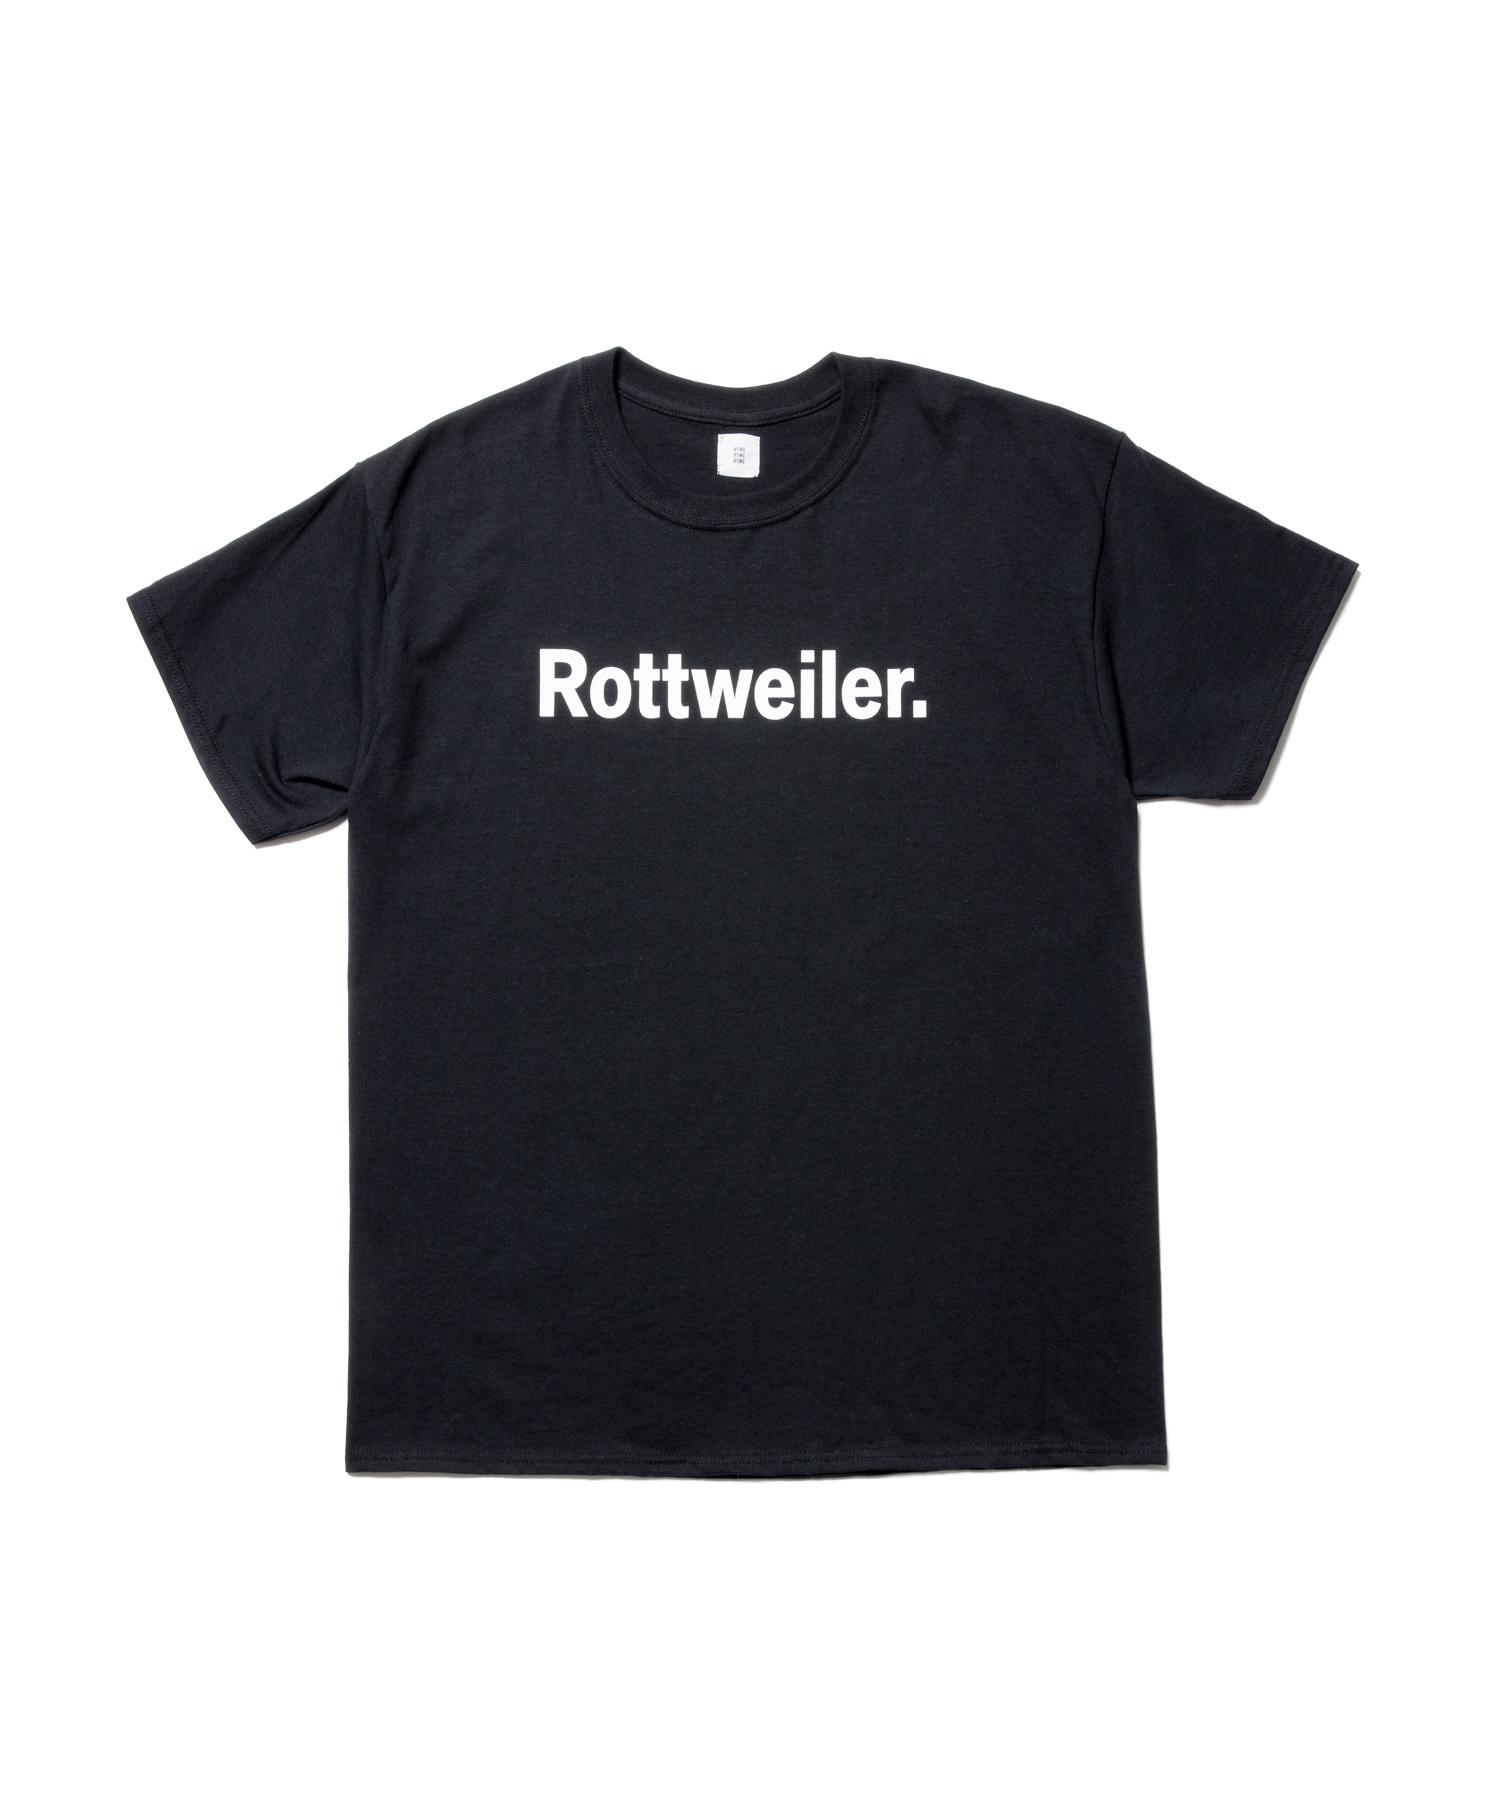 ROTTWEILER Tee